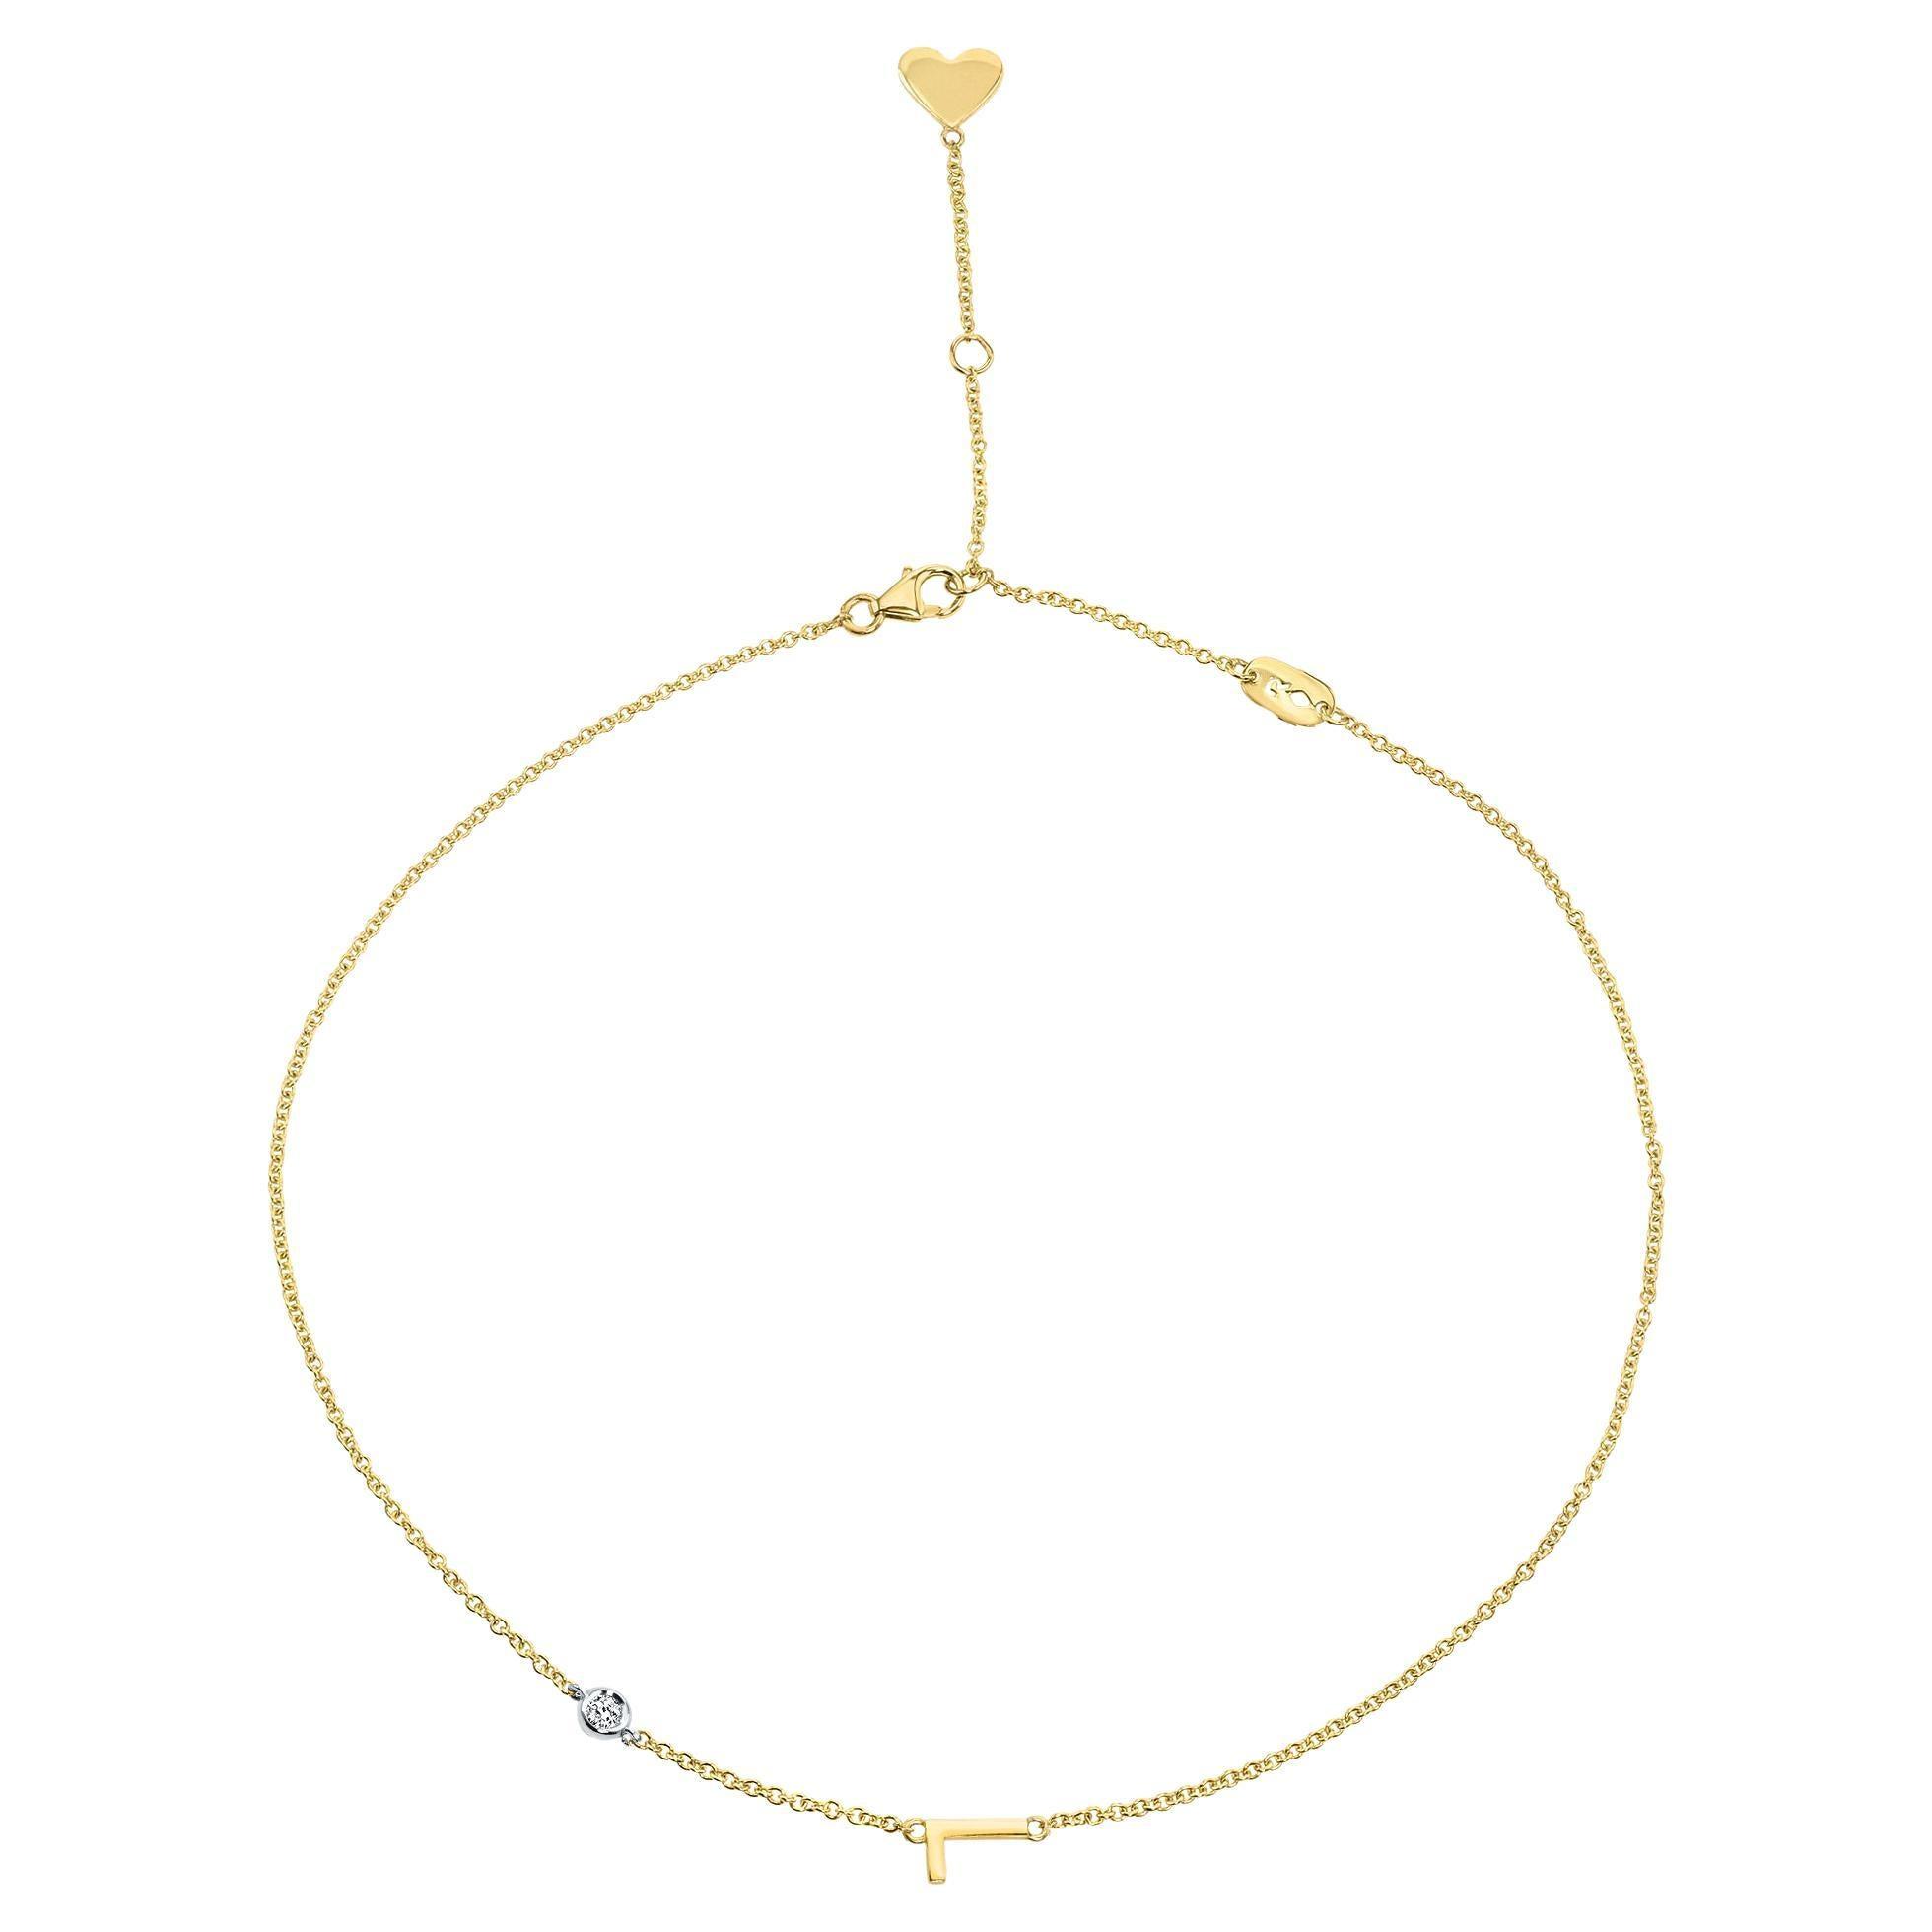 Genuine Diamond Asymmetrical Initial Necklace in 14k Yellow Gold, Shlomit Rogel